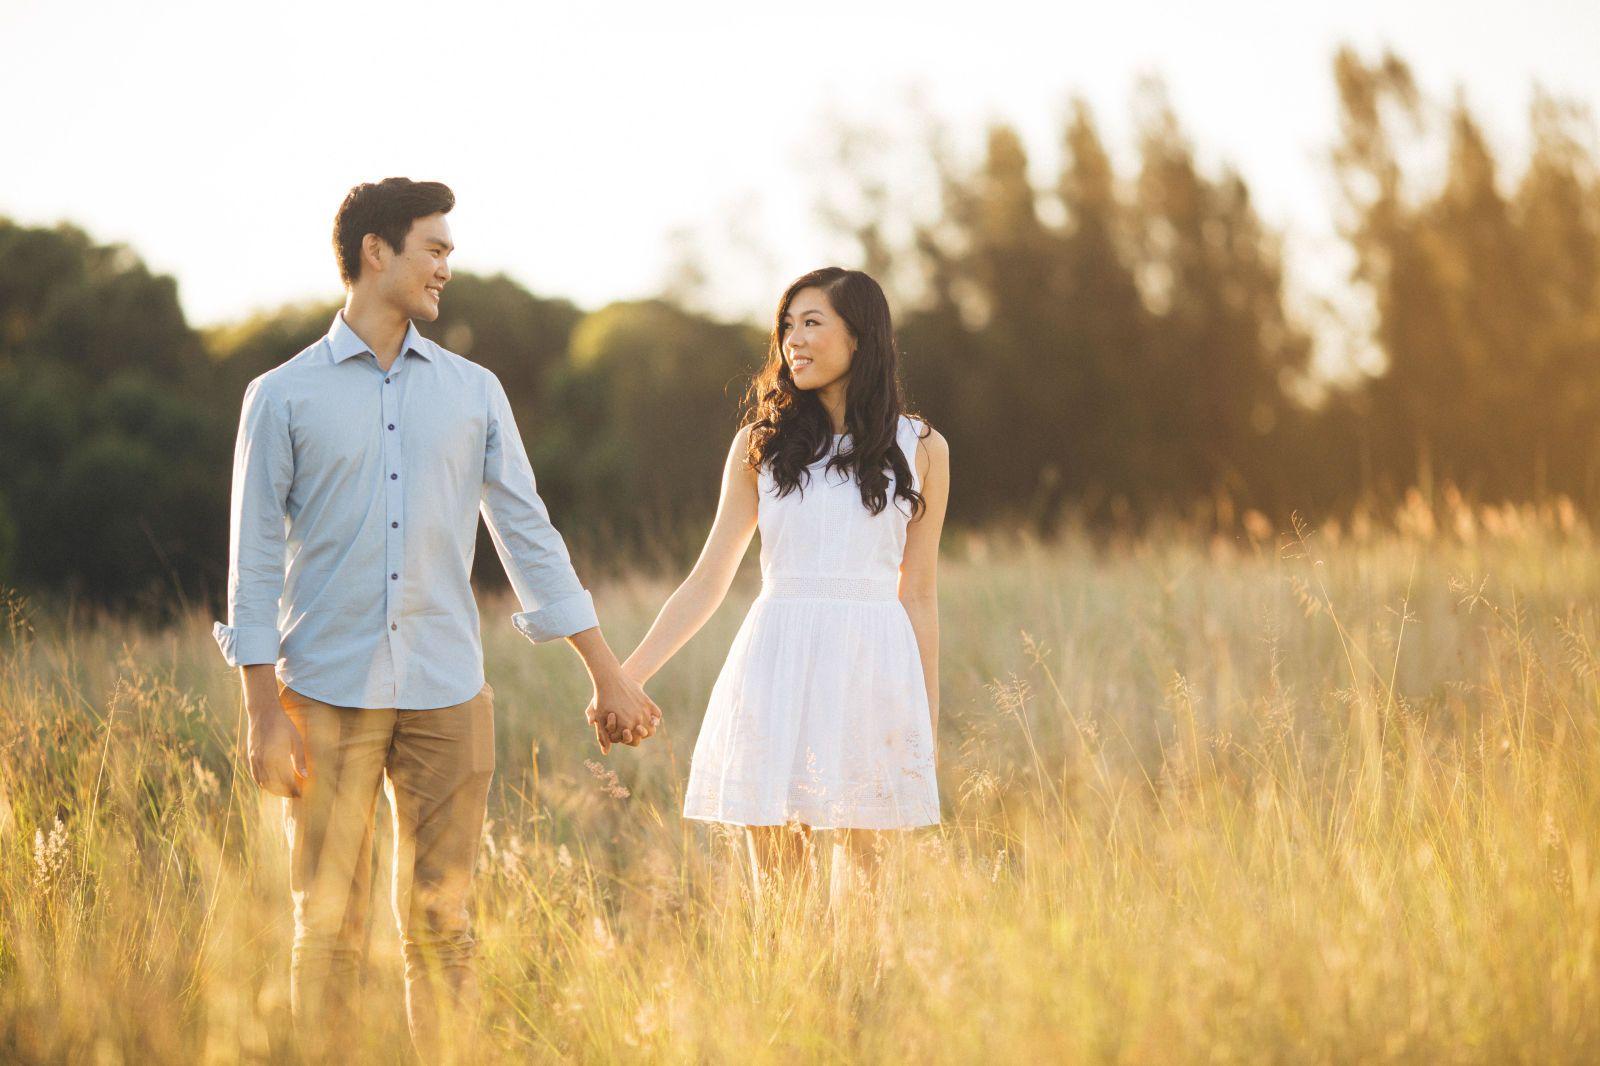 hpv dating websites